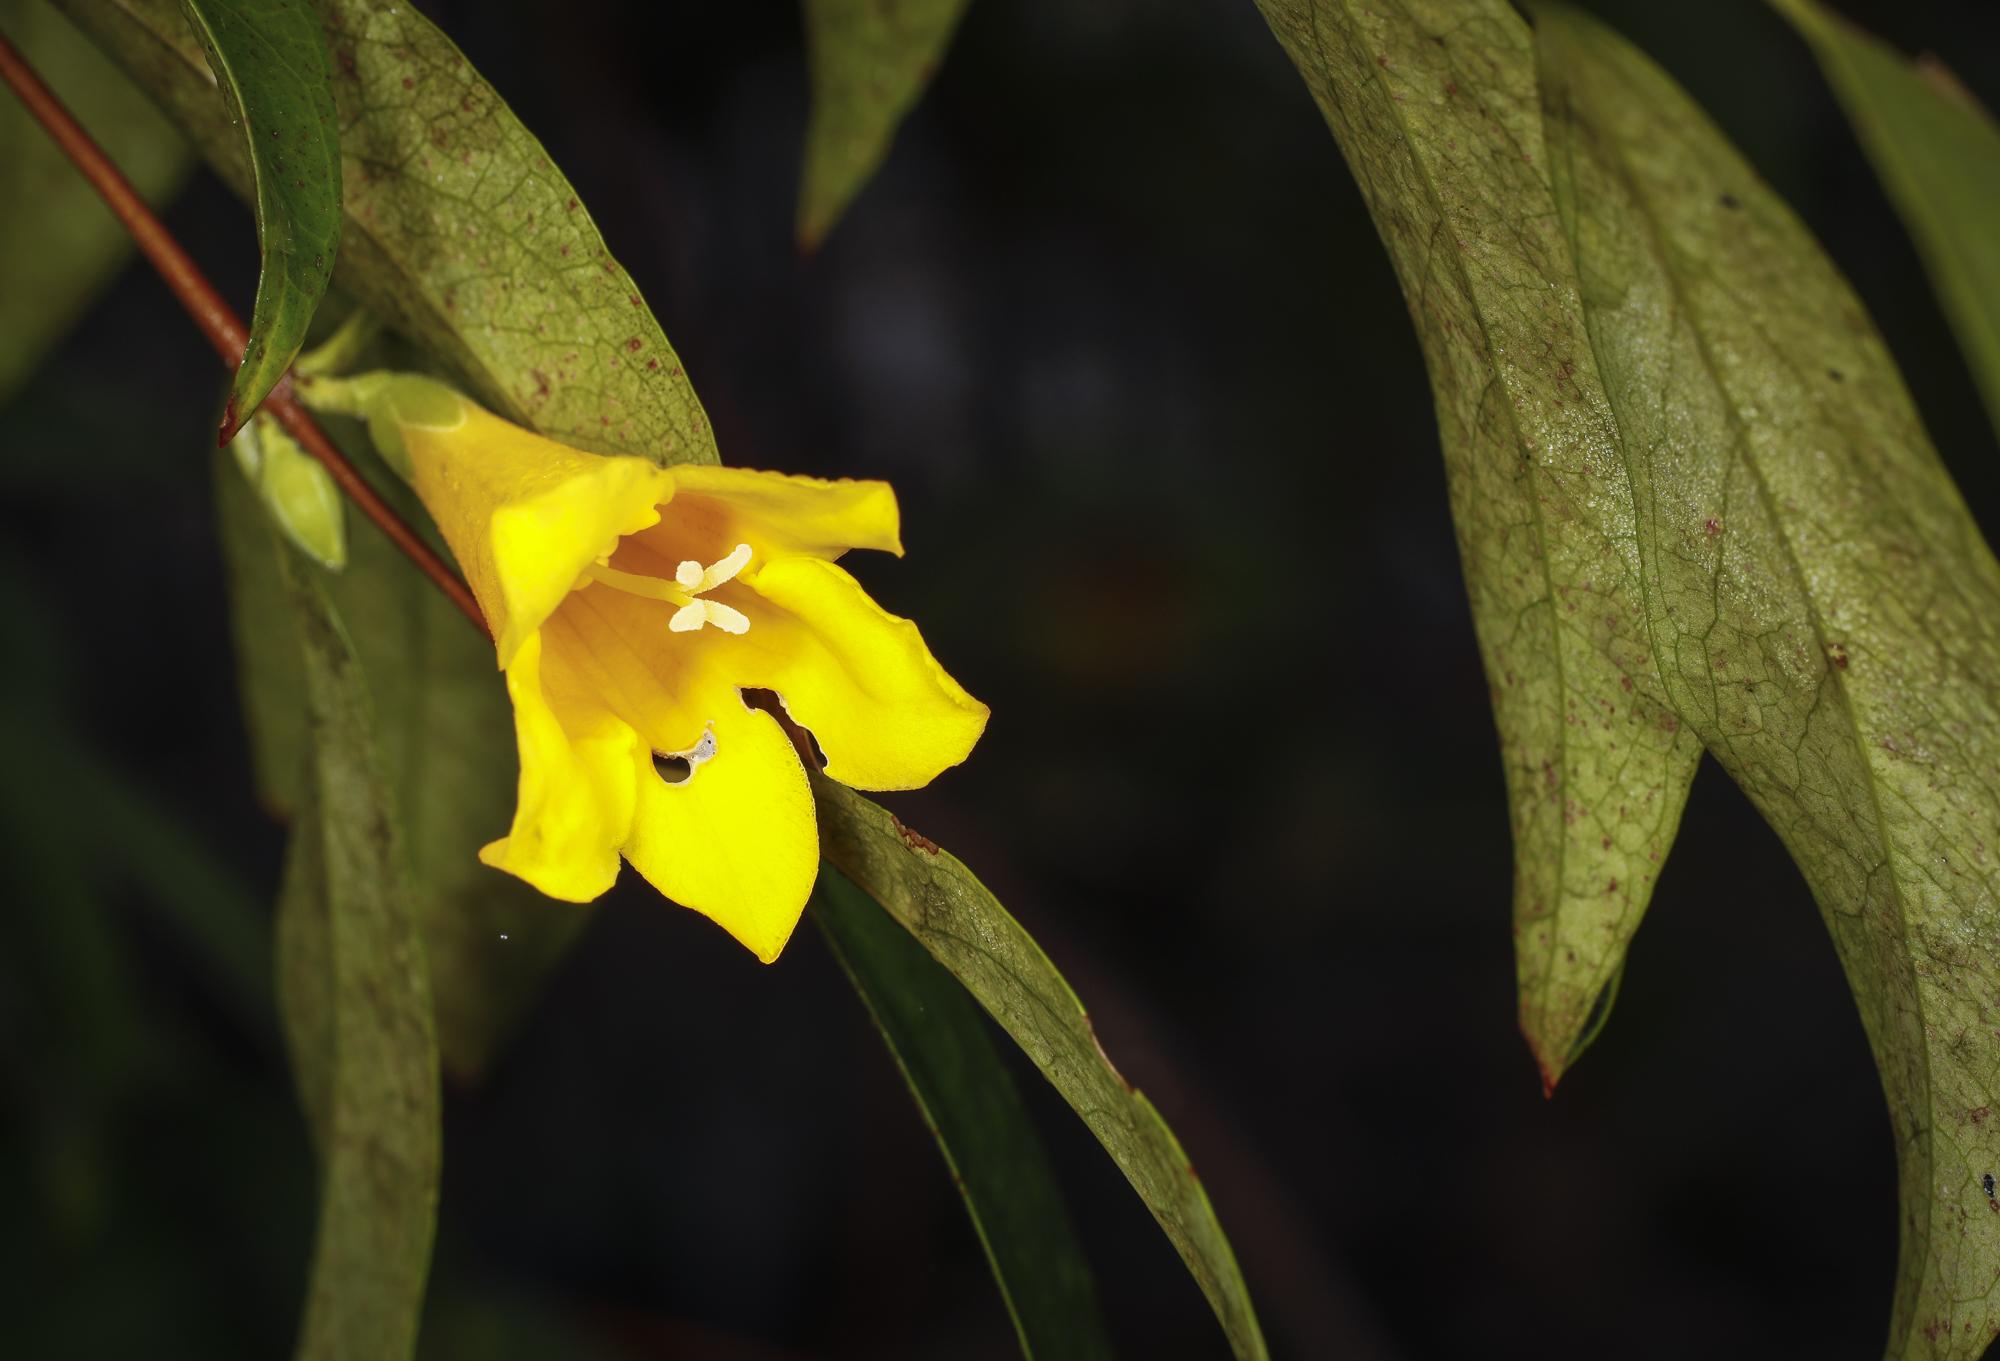 yellow jessamine flower